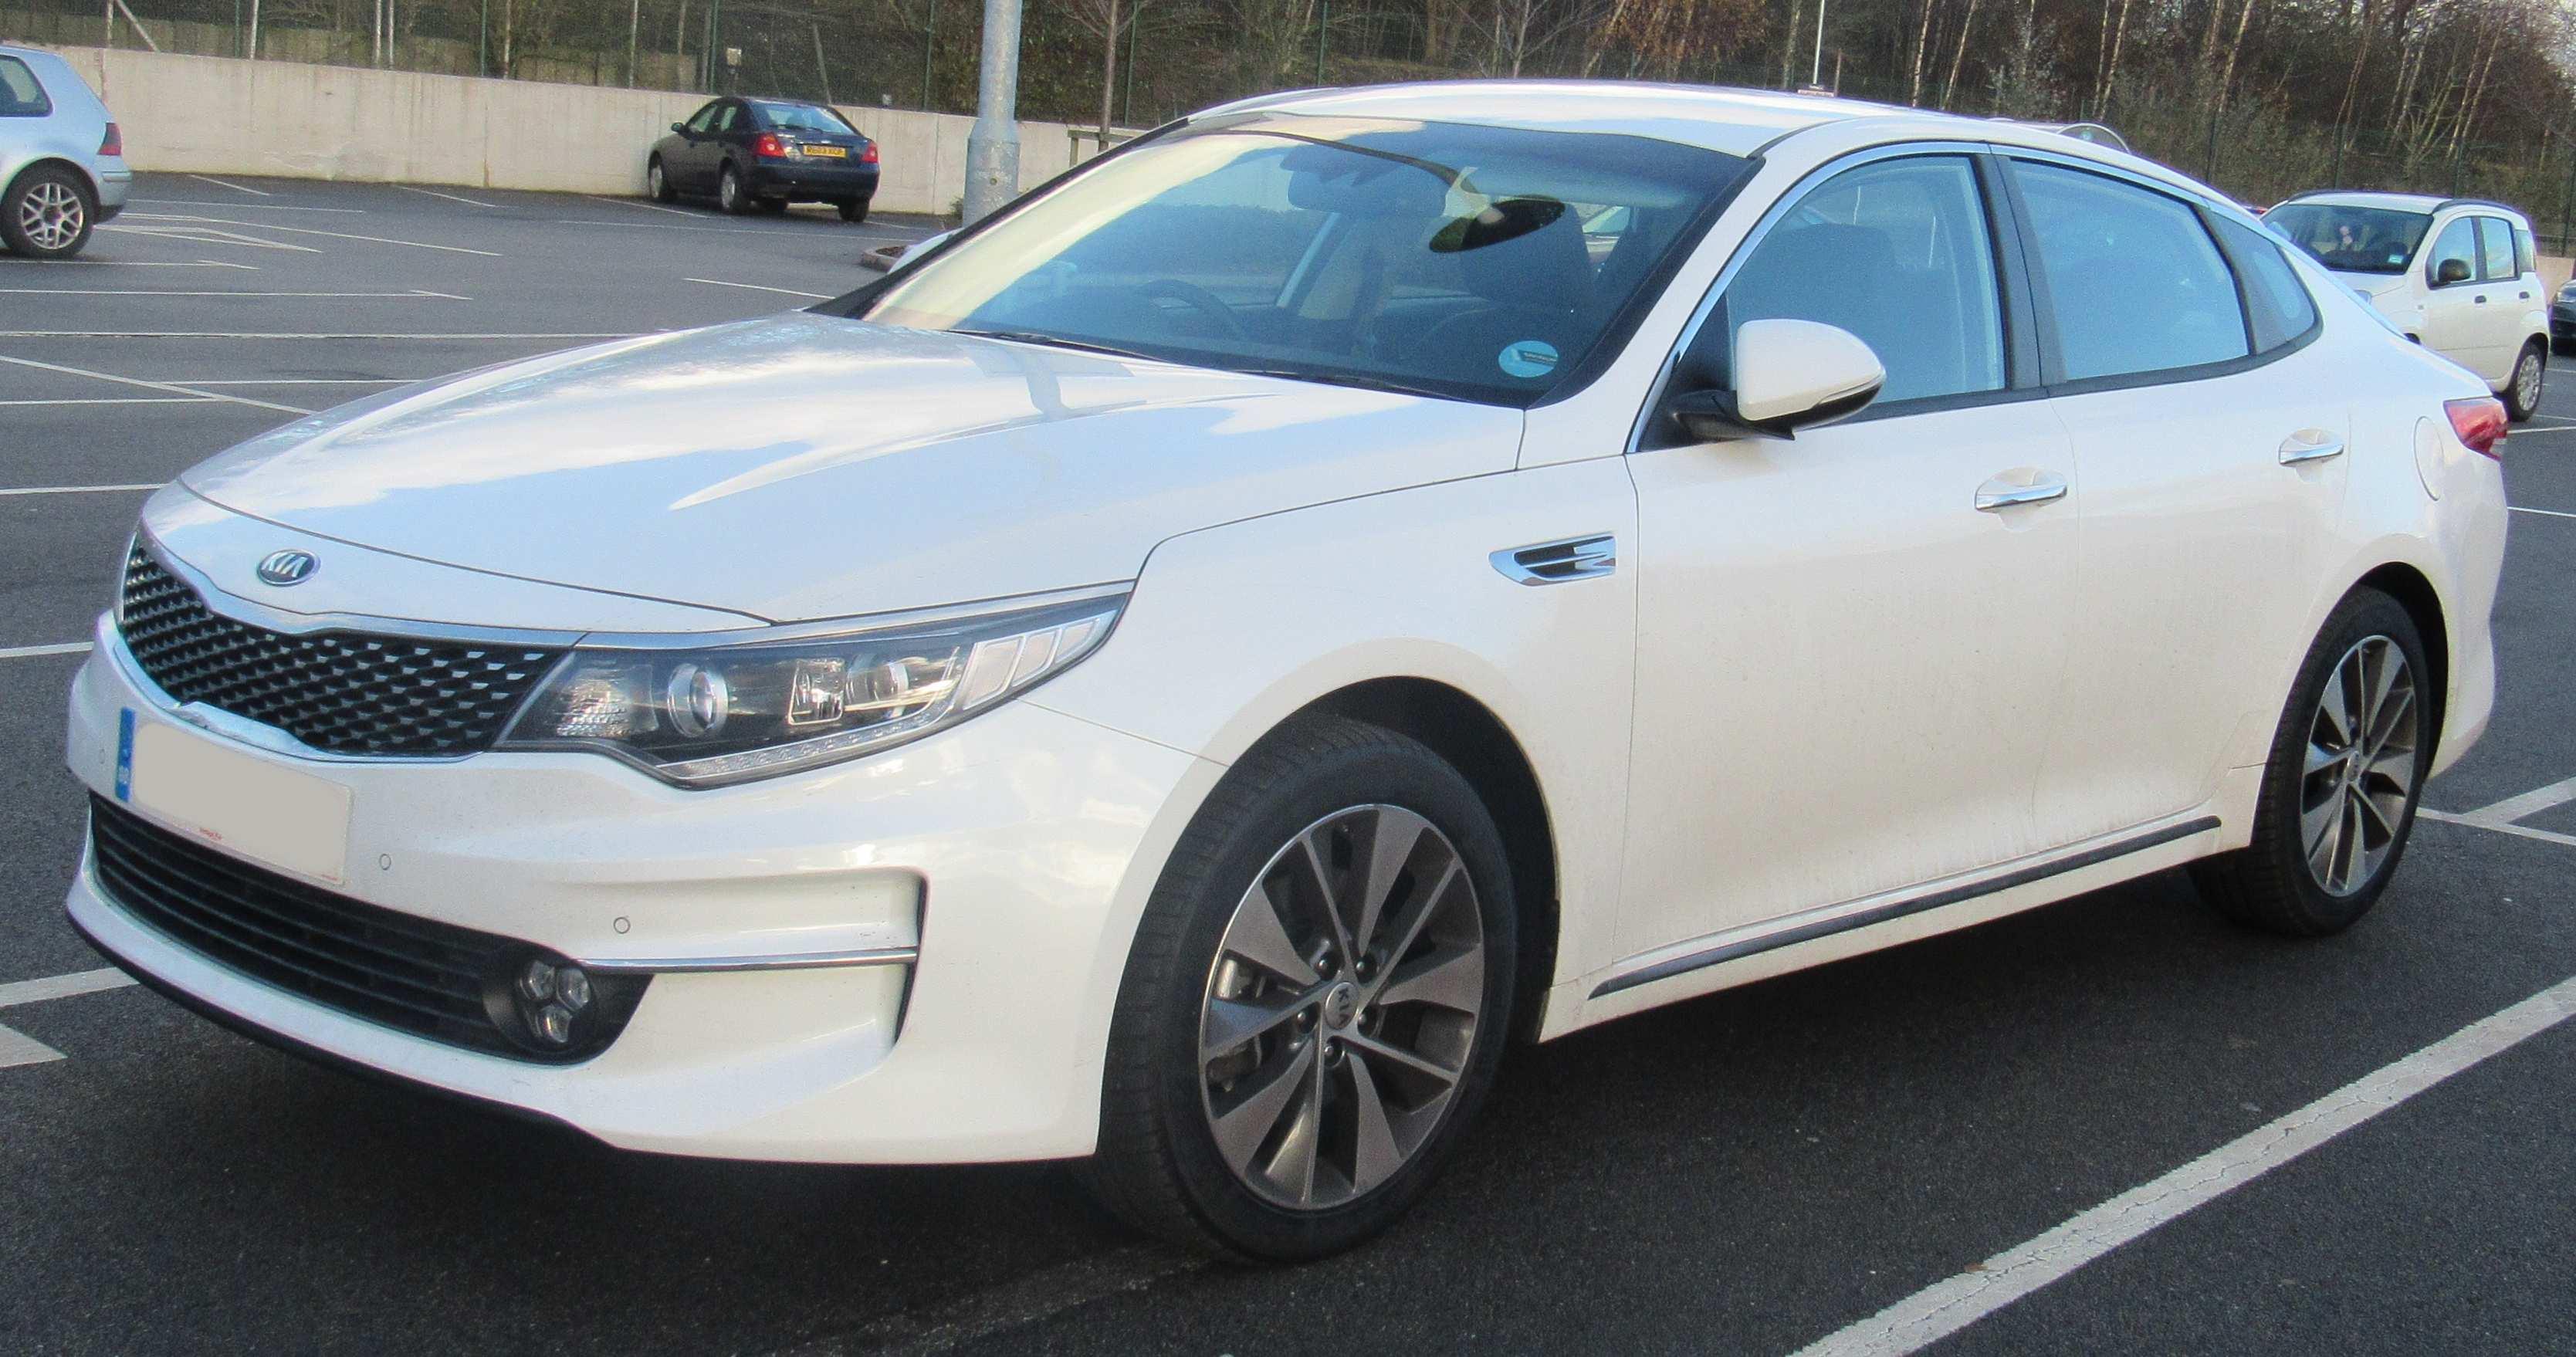 69 All New 2020 Kia Optima Redesign Pricing by 2020 Kia Optima Redesign